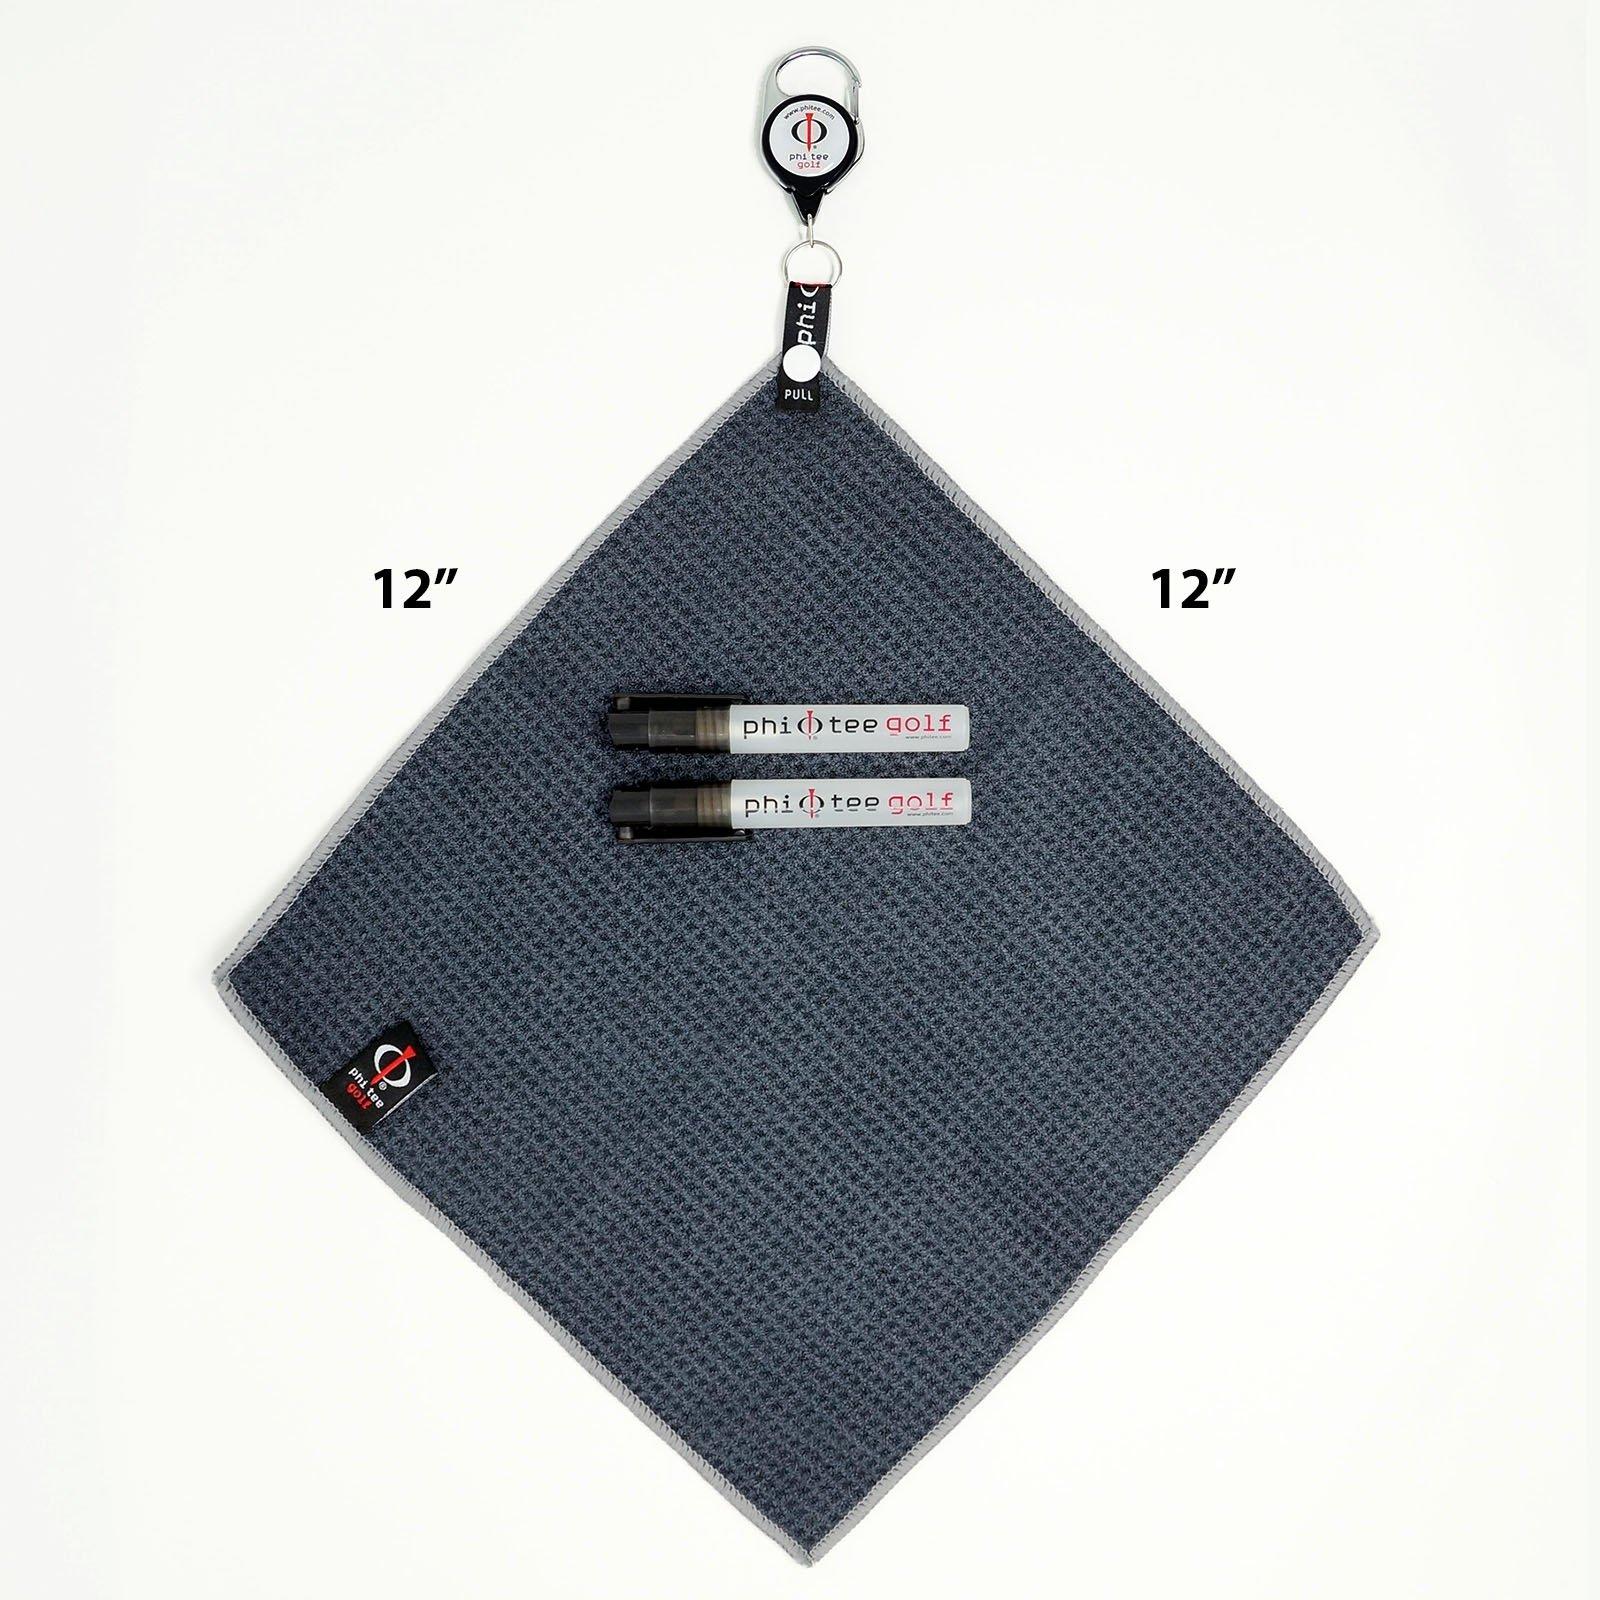 Phi Tee Tail Golf Towel Starter Set (2 Pack)